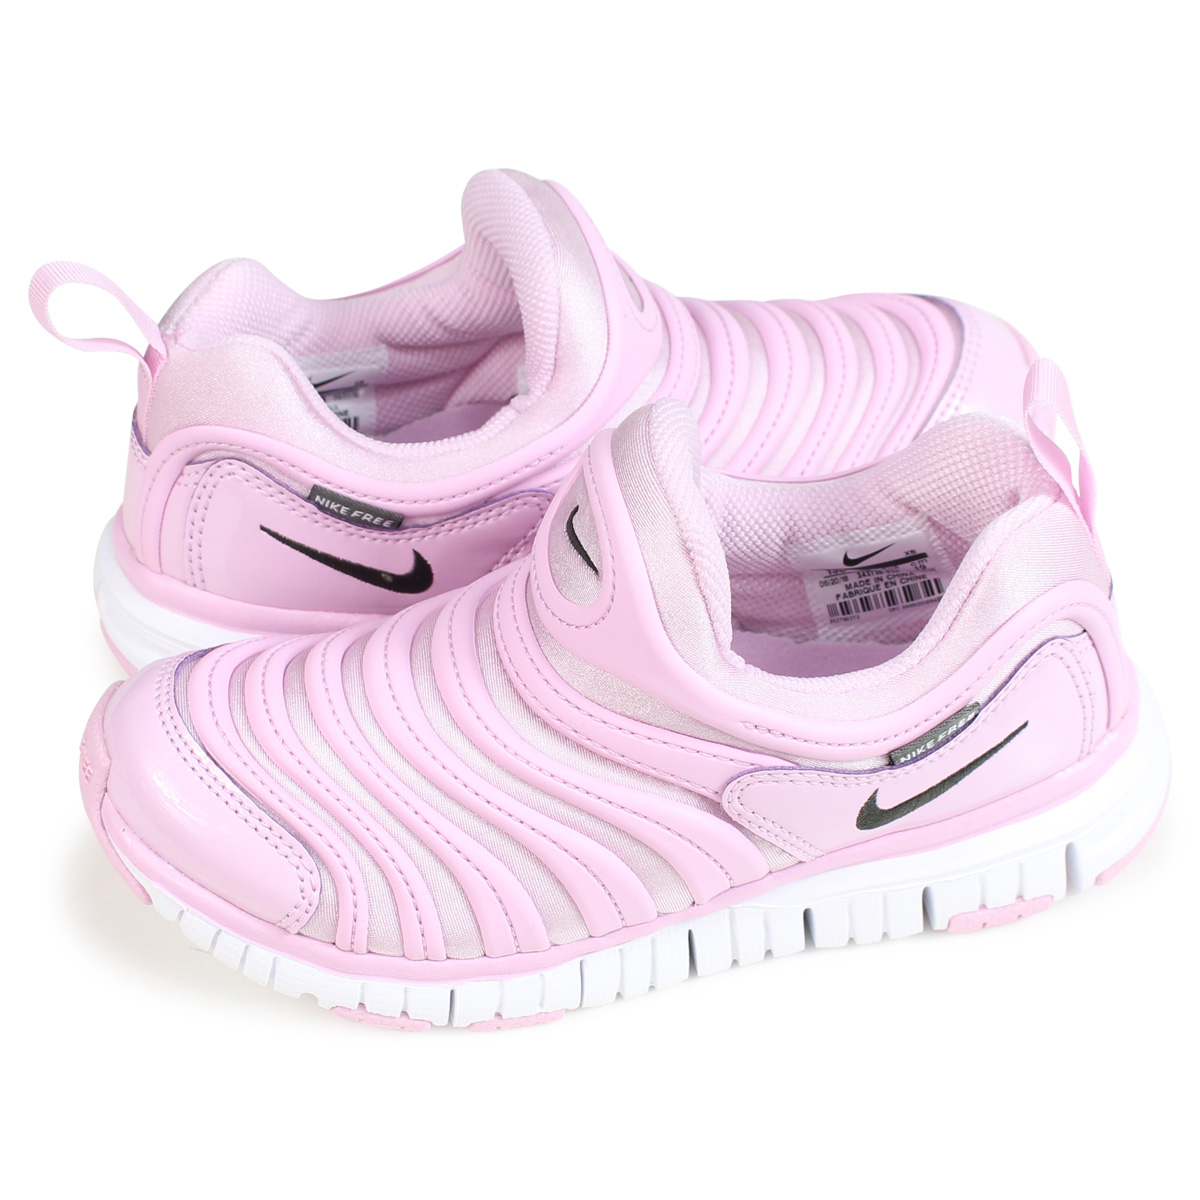 7ae9c9aef921 ALLSPORTS  Nike NIKE dynamo-free kids sneakers DYNAMO FREE PS ...